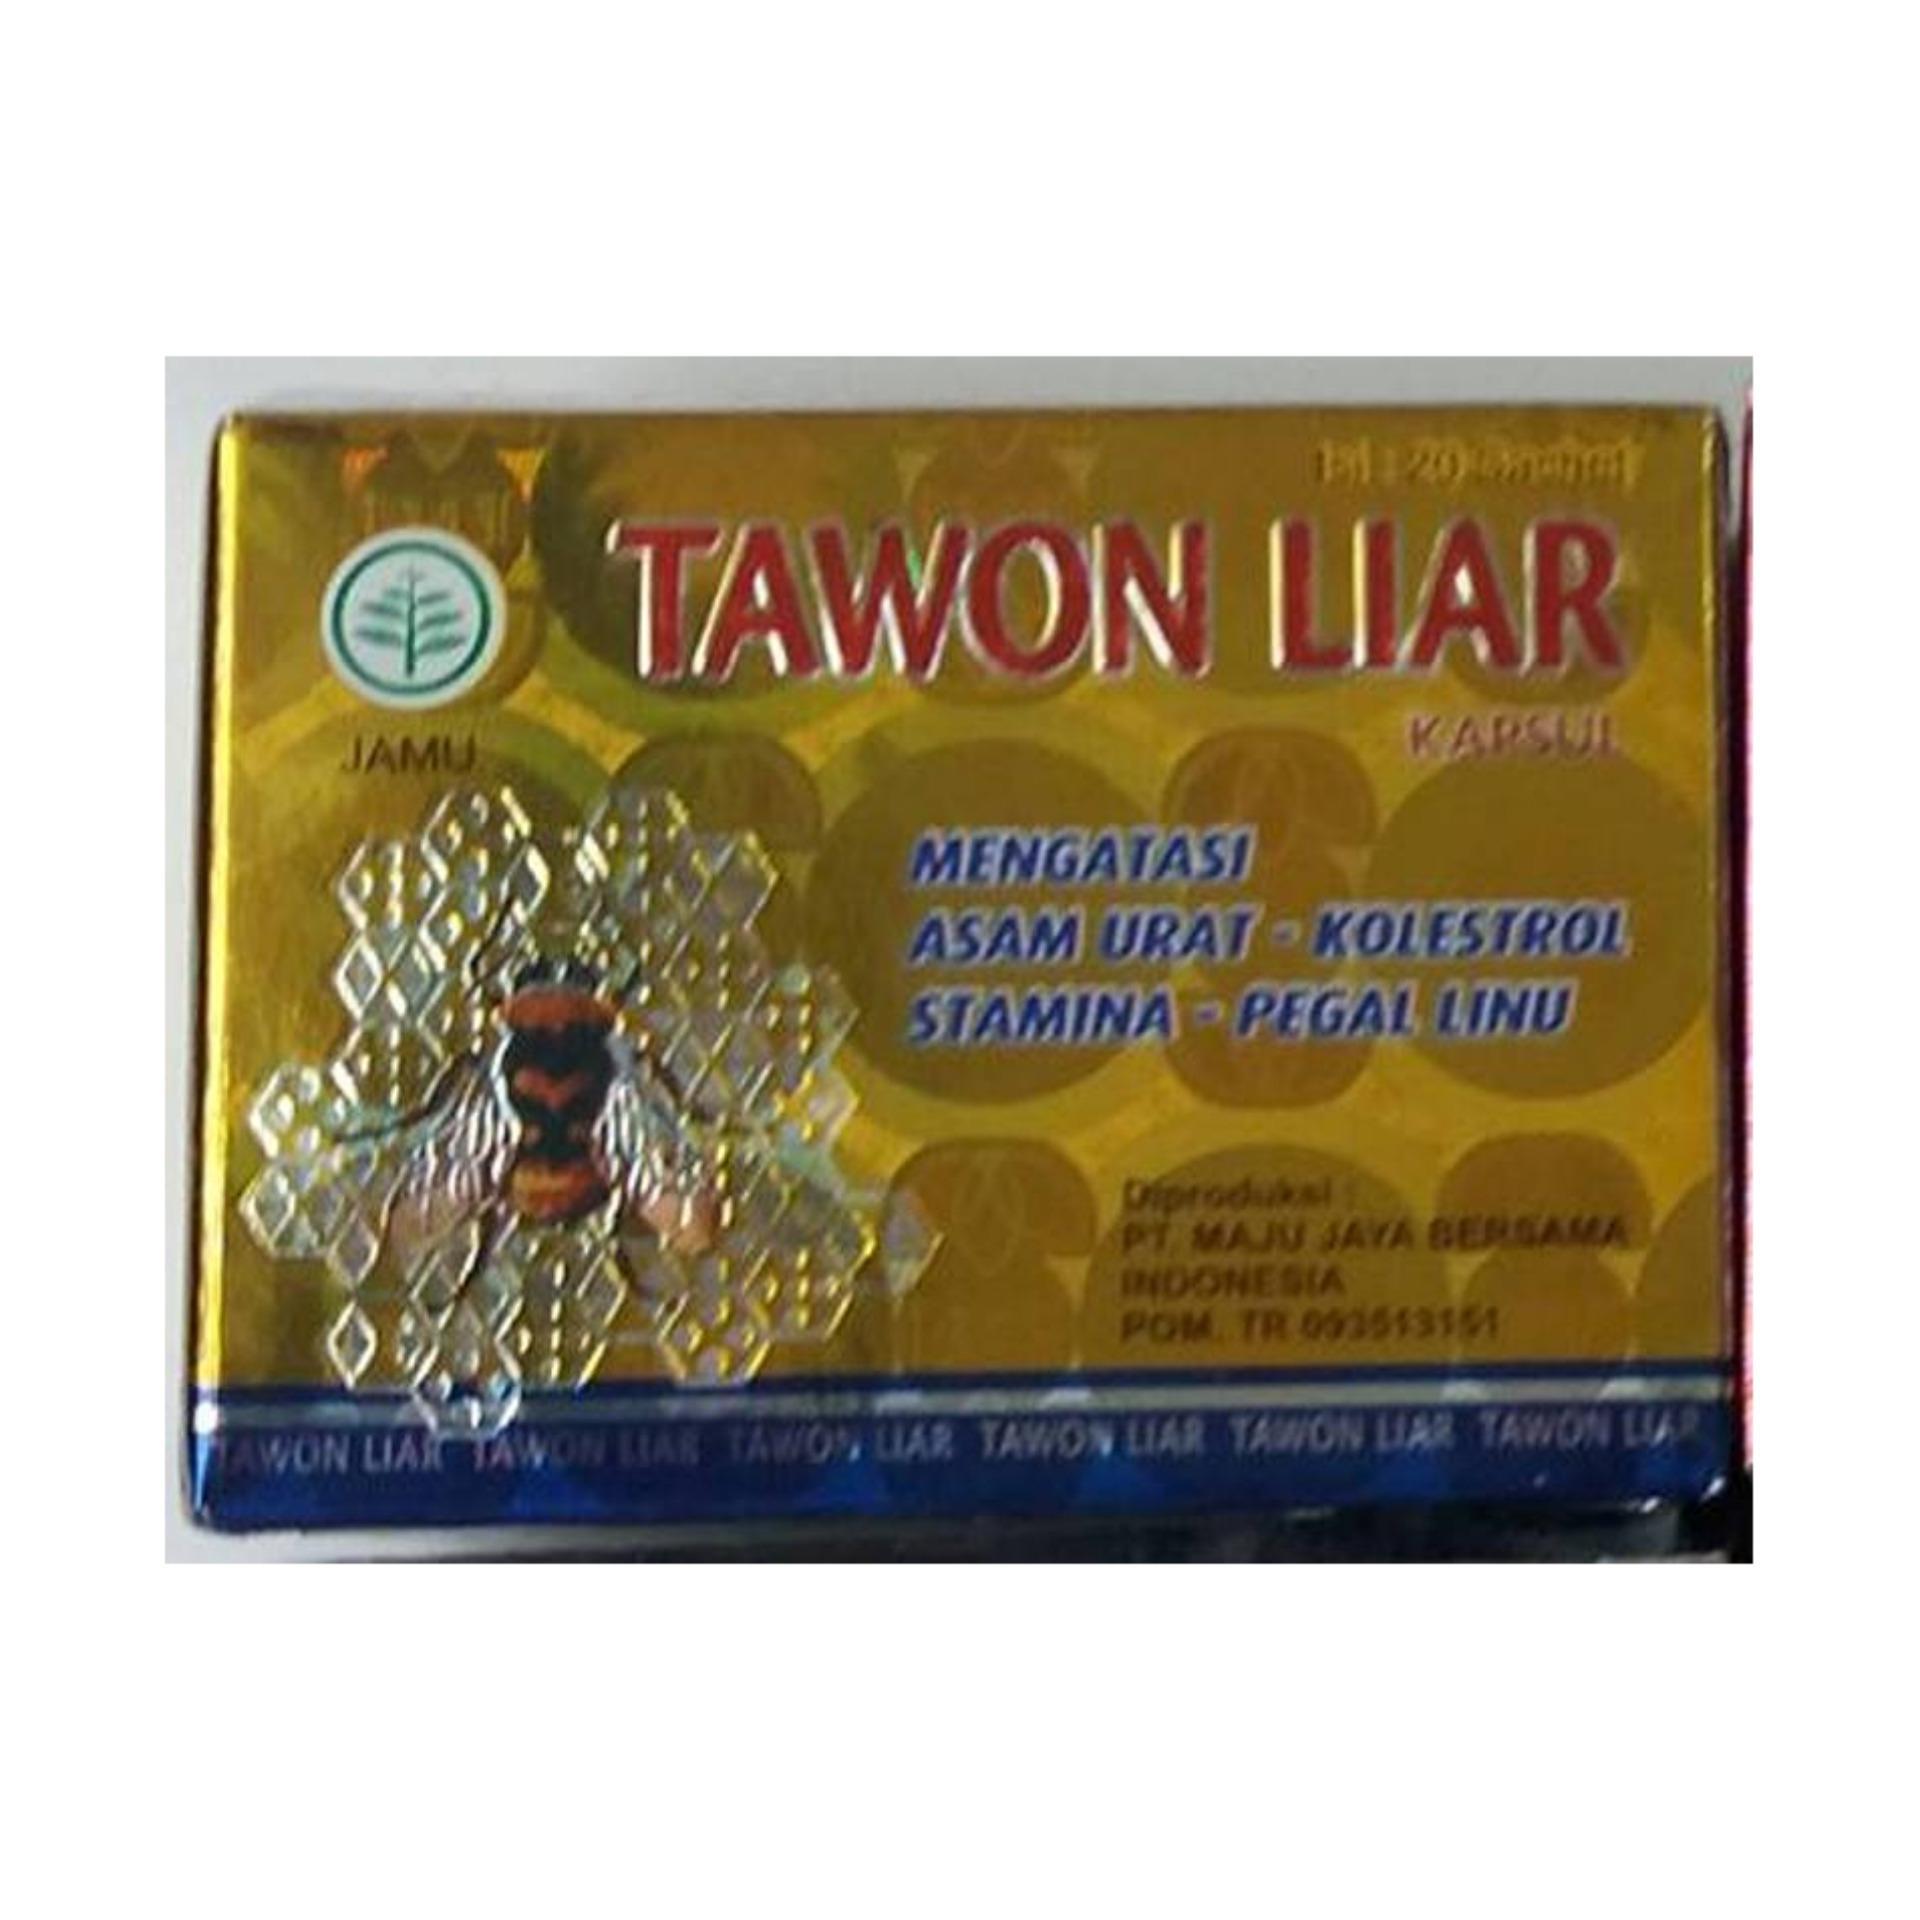 Flash Sale Jamu Tawon Liar - Mengobati Asam urat, Pegel Linu - 1 pcs